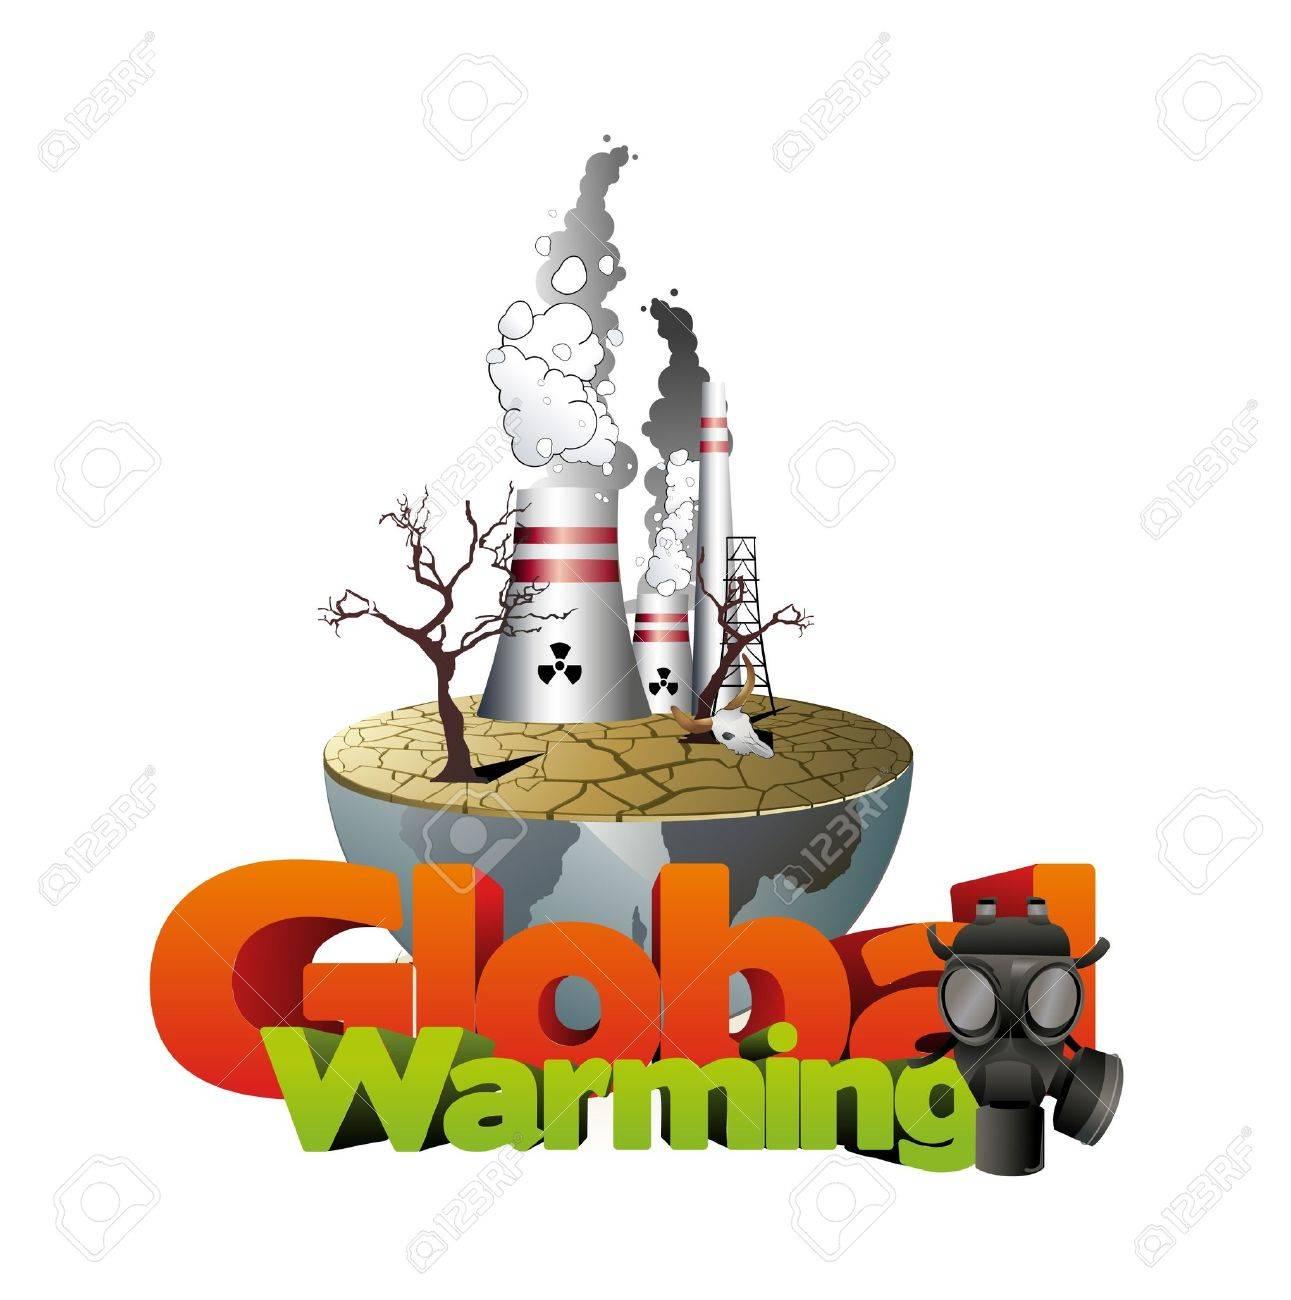 global warming vector illustration Stock Vector - 9679551